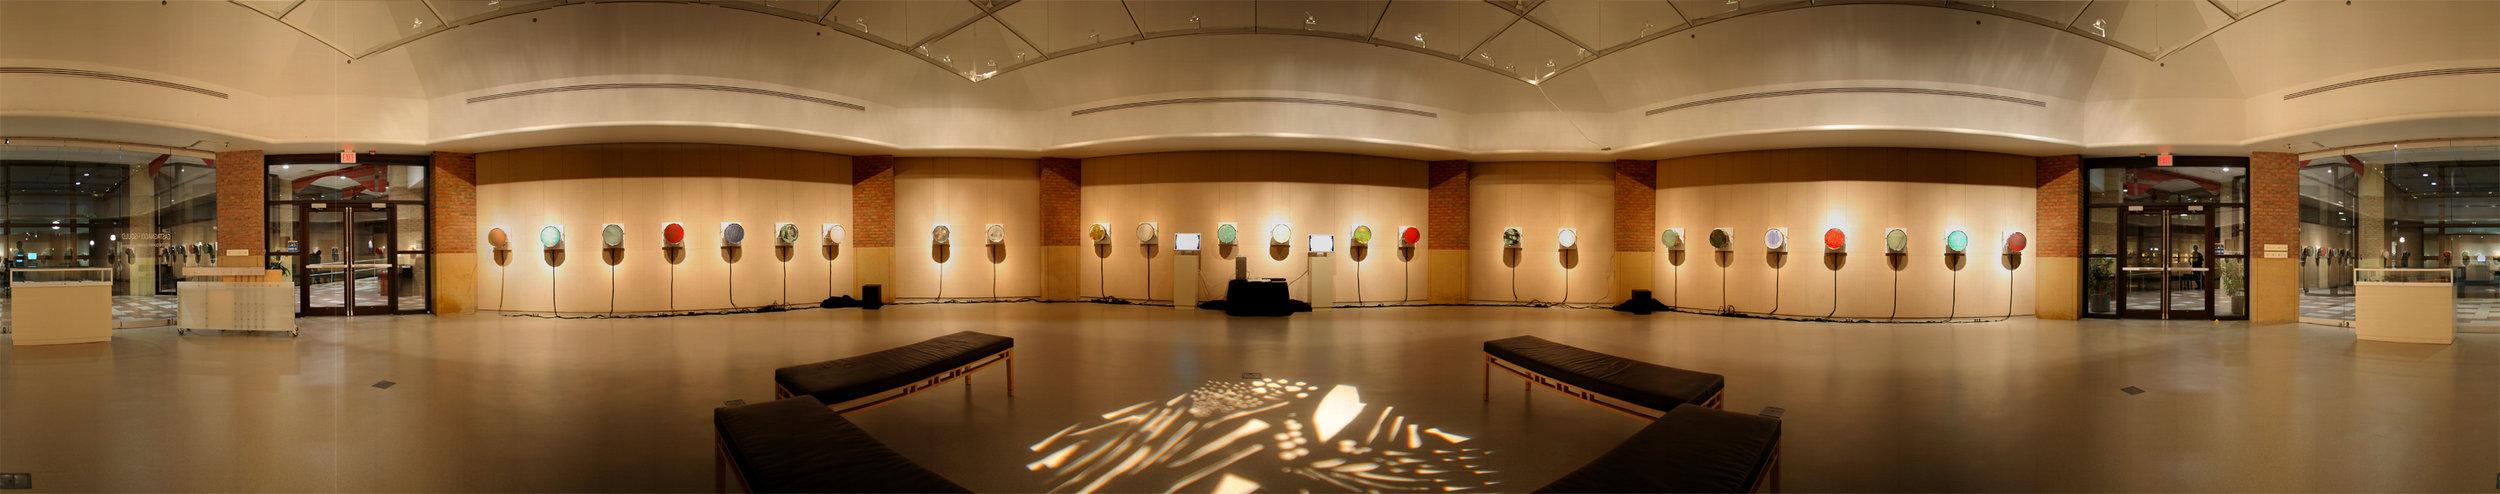 Gould Gallery SM_02.jpg